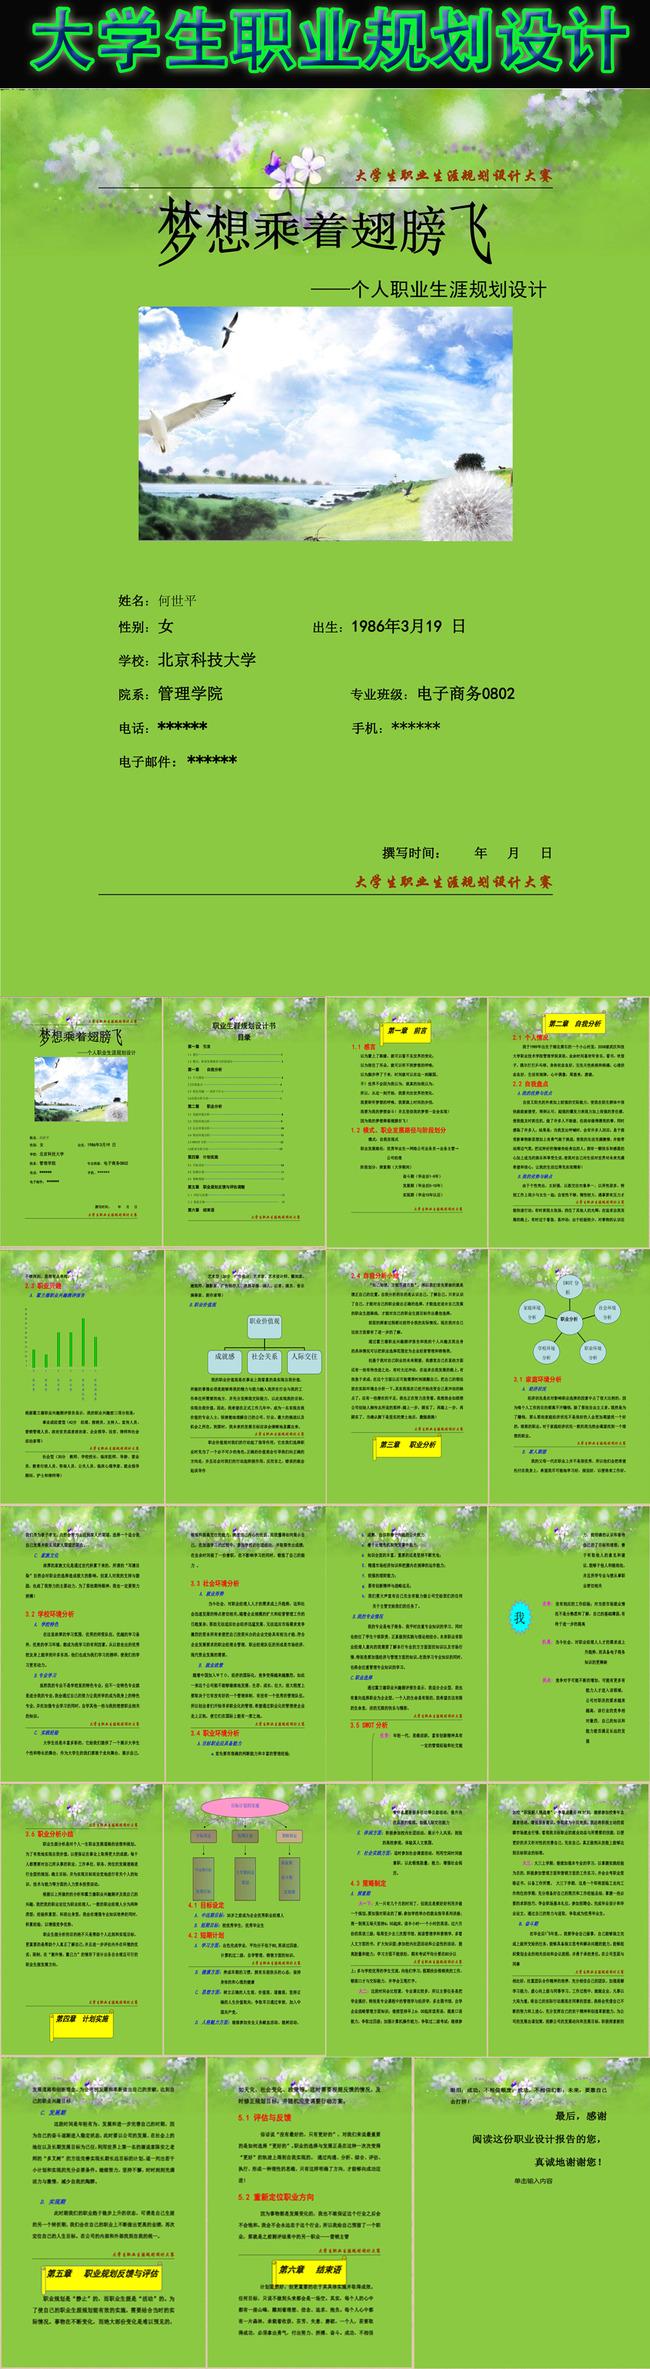 word模板 应用文书 > 大学生职业生涯规划设计大赛